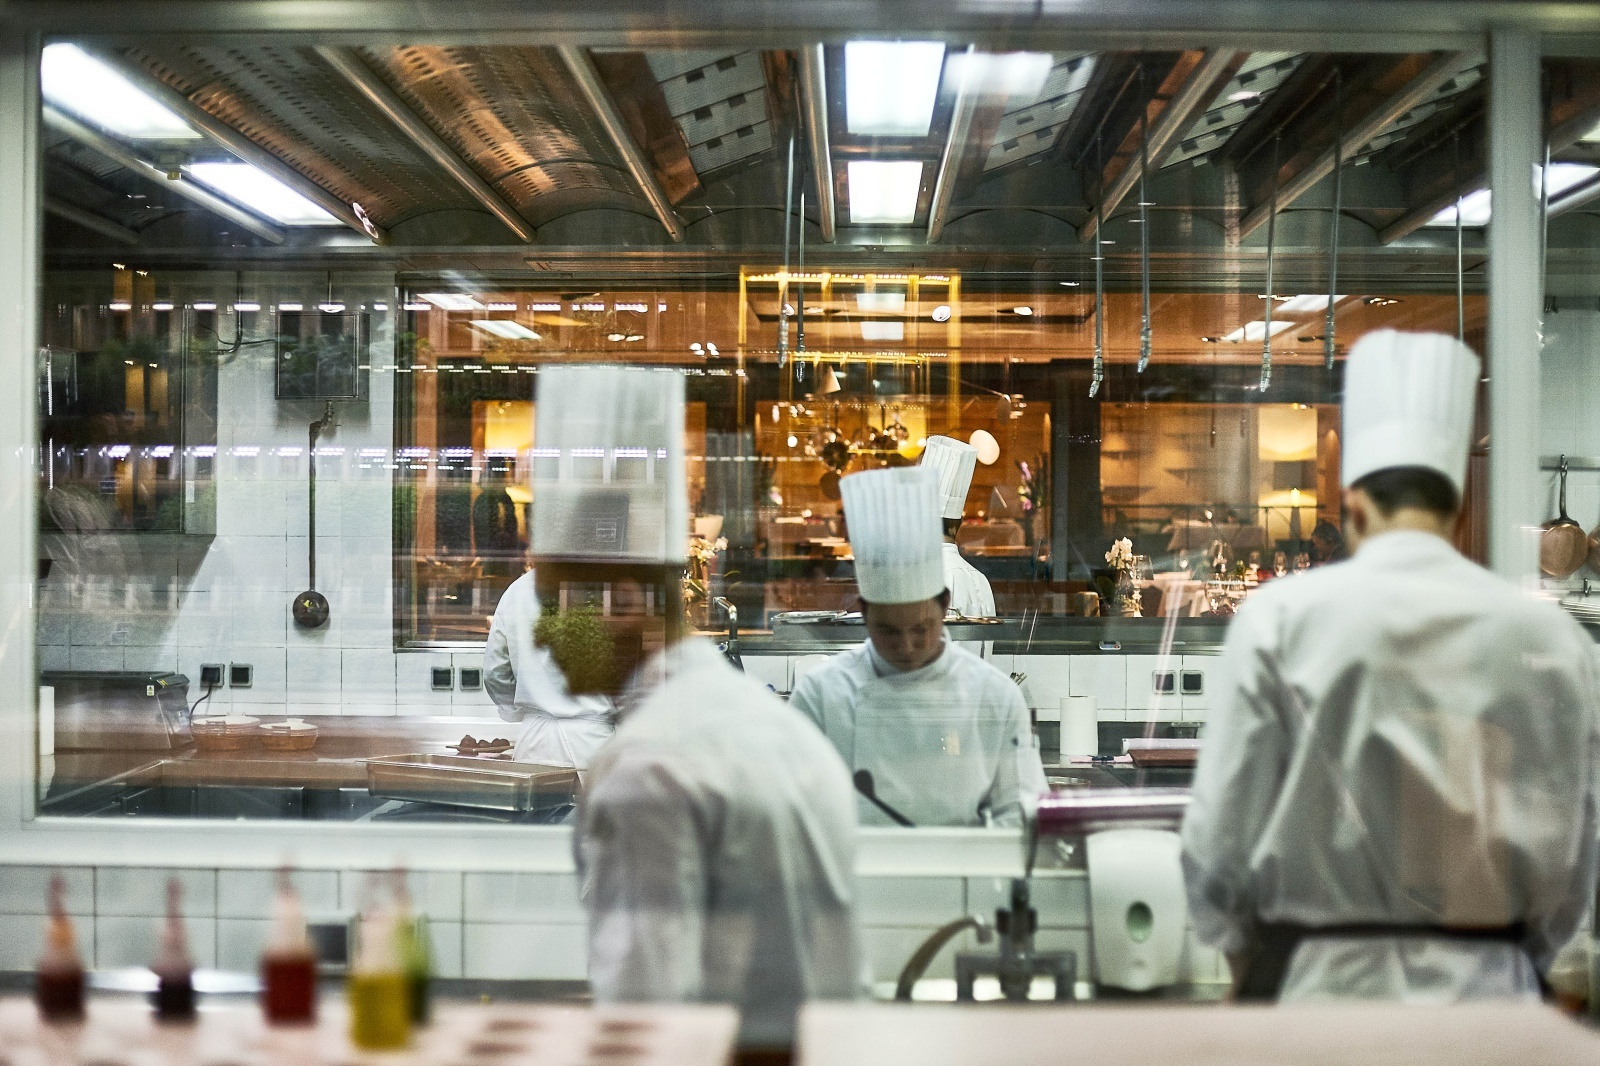 restaurante santceloni Madrid